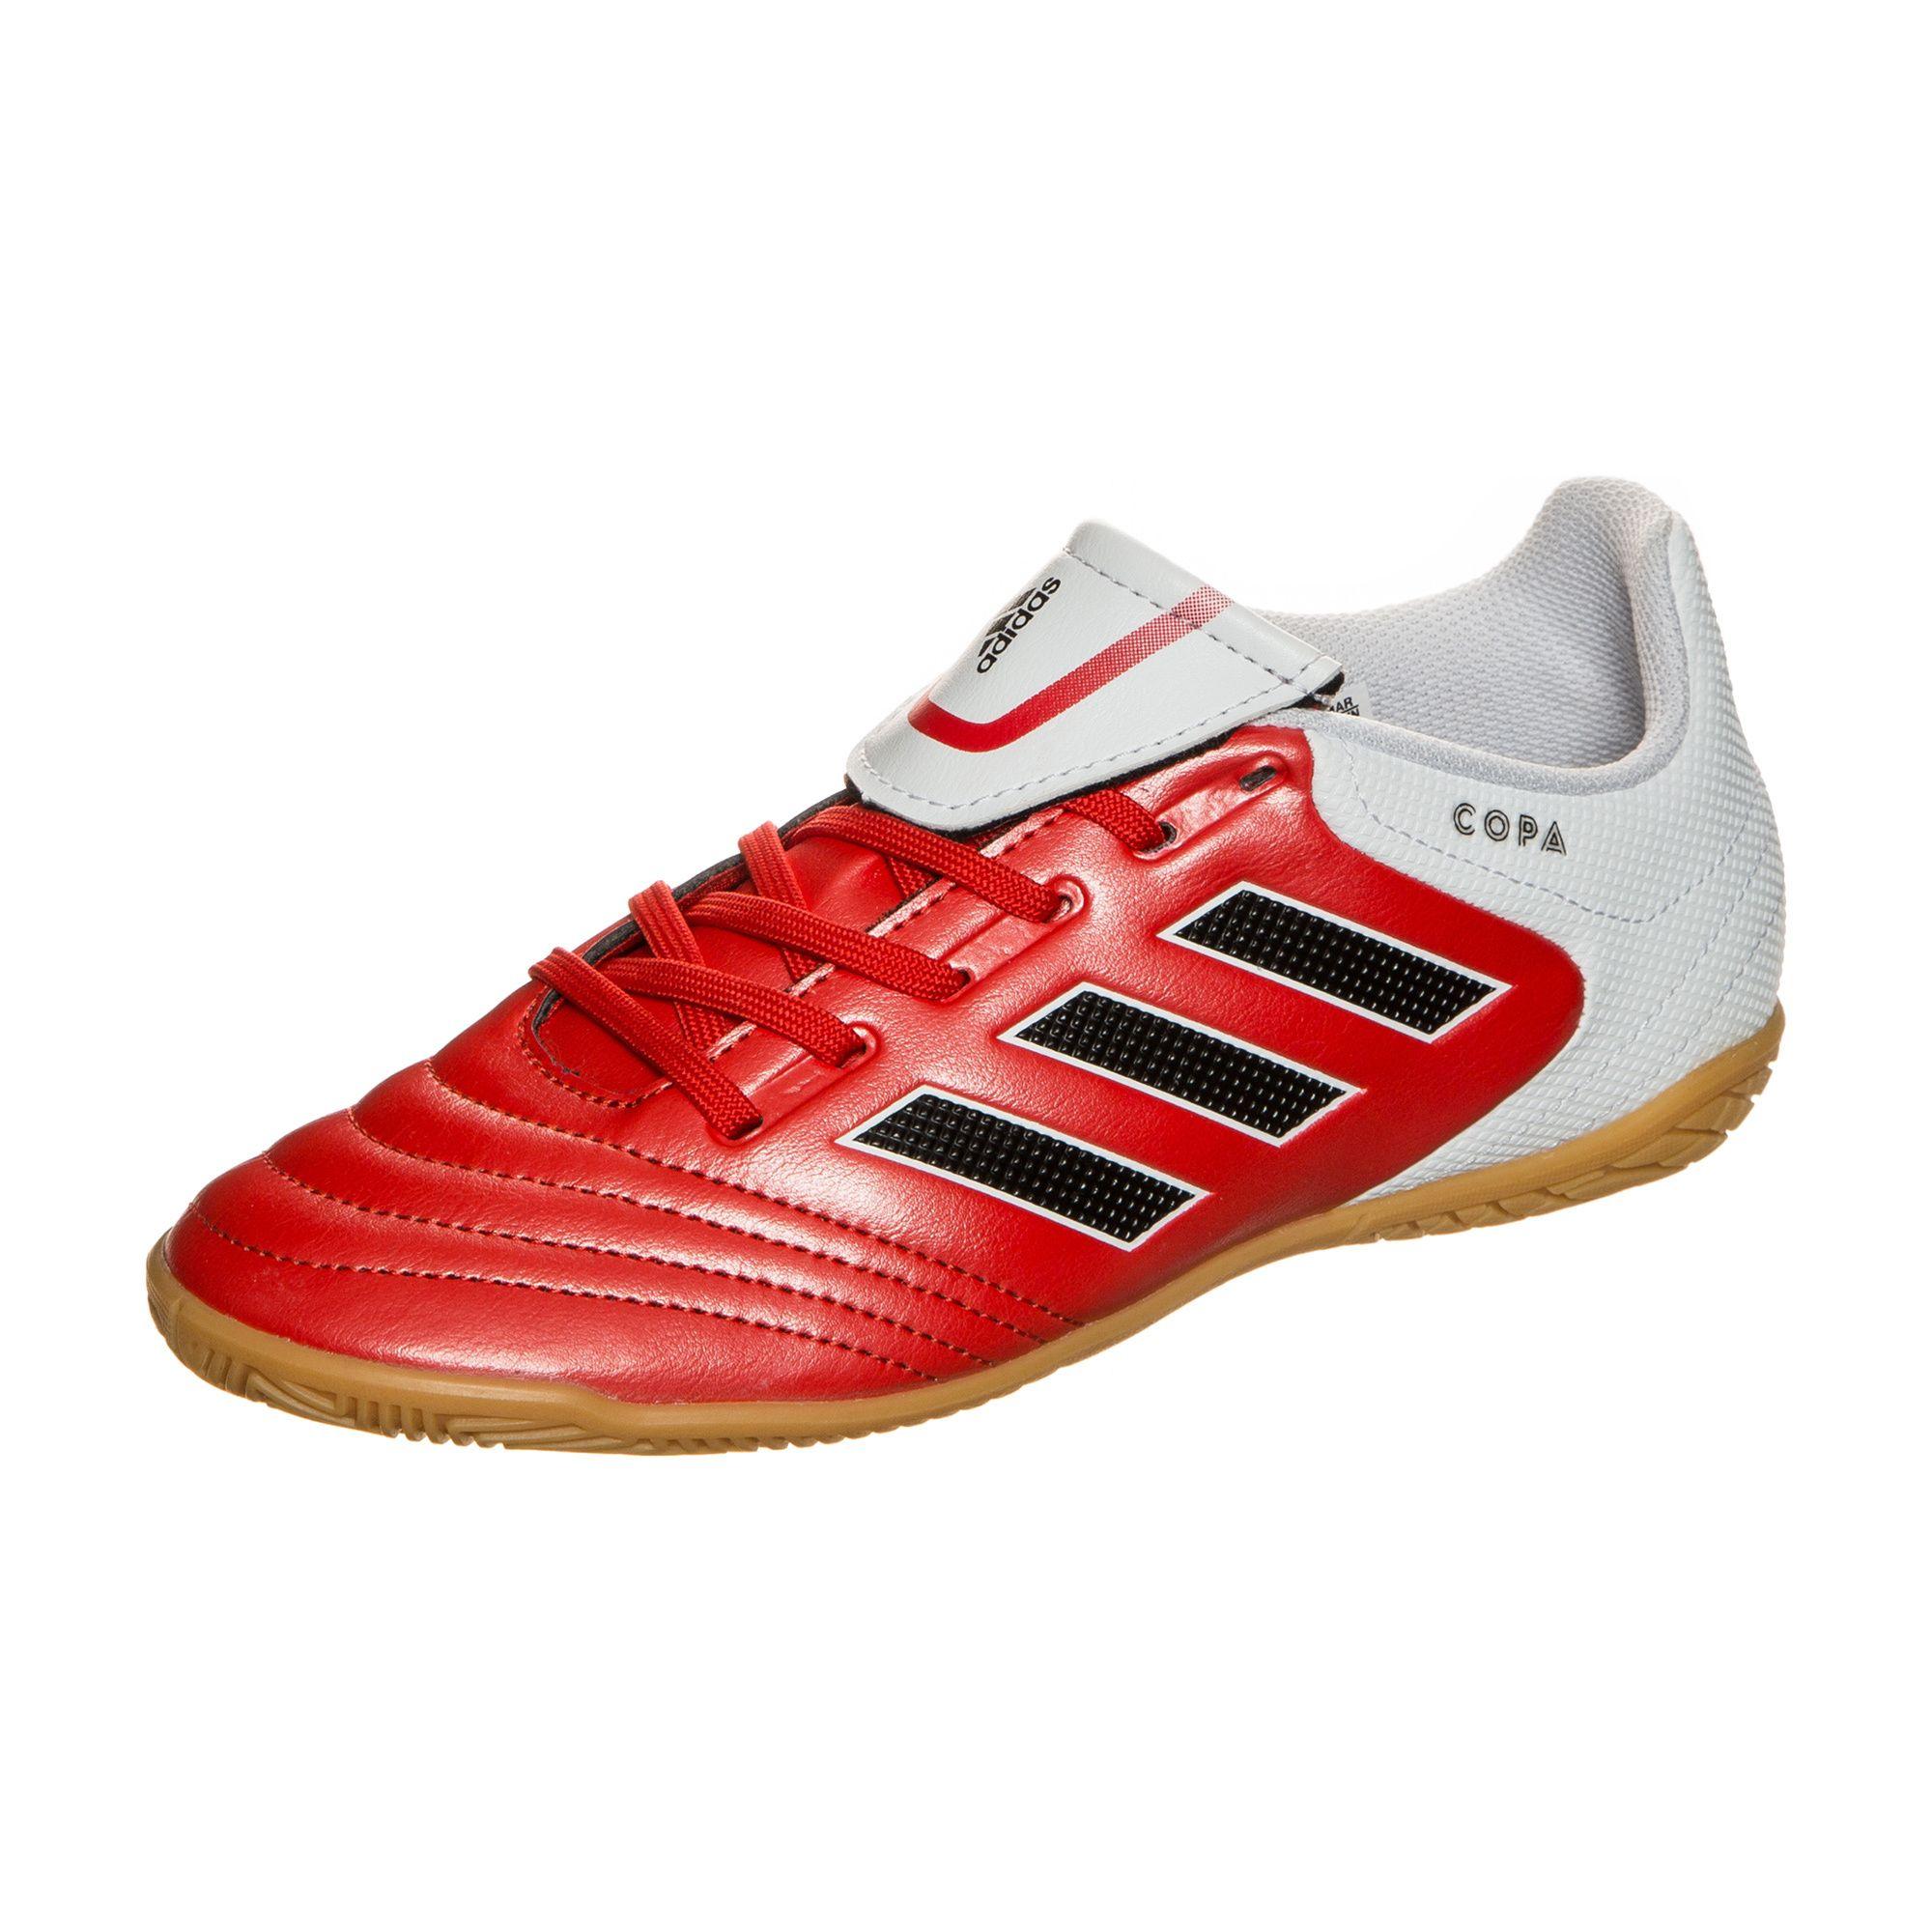 ADIDAS PERFORMANCE adidas Performance Copa 17.4 Indoor Fußballschuh Kinder